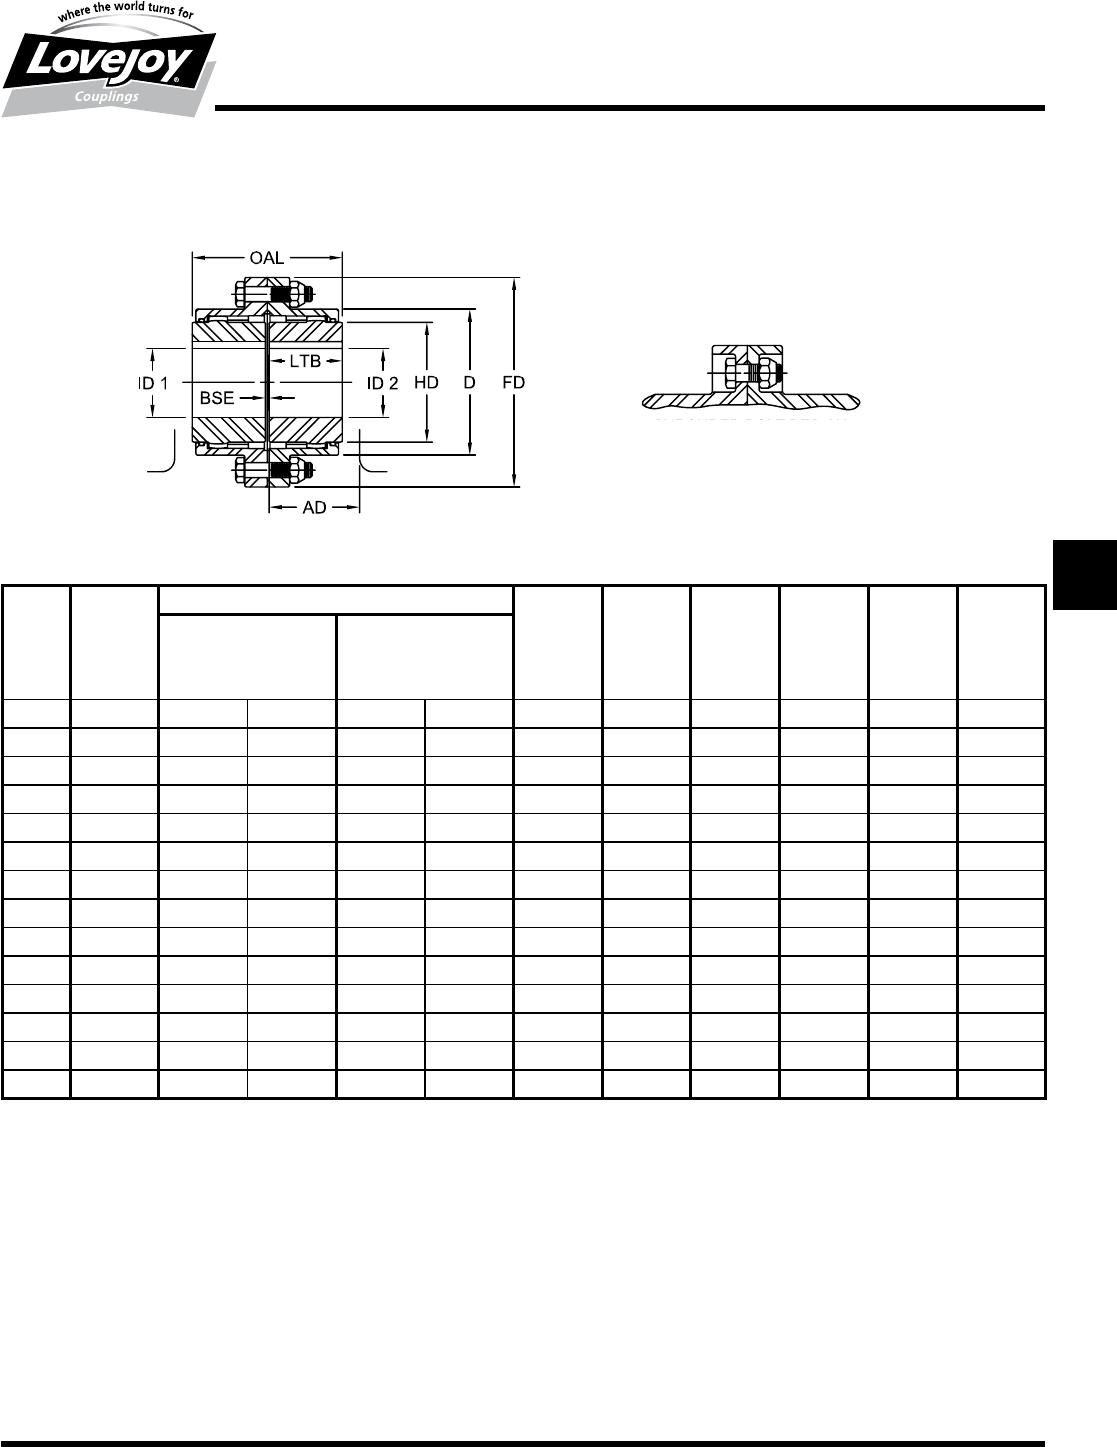 7//8-9Thread x 1-3//4 OAL Te-Co Series 803 Flange Nuts